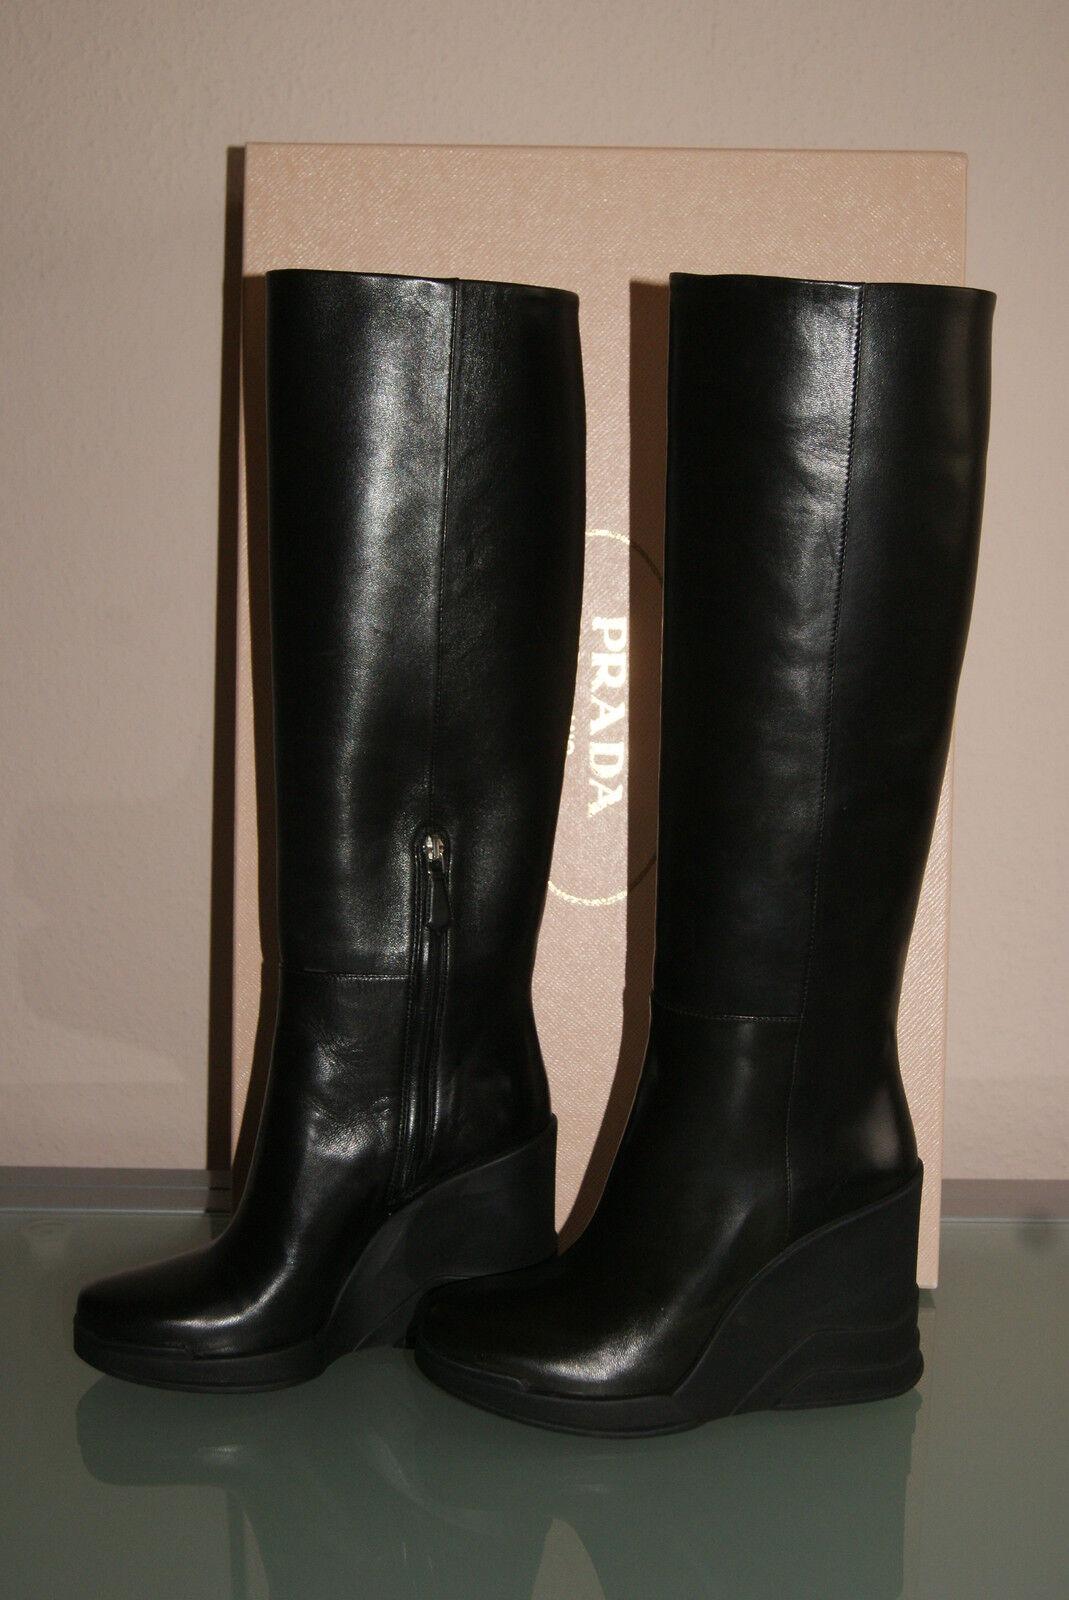 PRADA Stiefel Gr. 39 Keilstiefel Plateau Stiefel schwarz Lederstiefel Lederstiefel Lederstiefel NEU ec1689